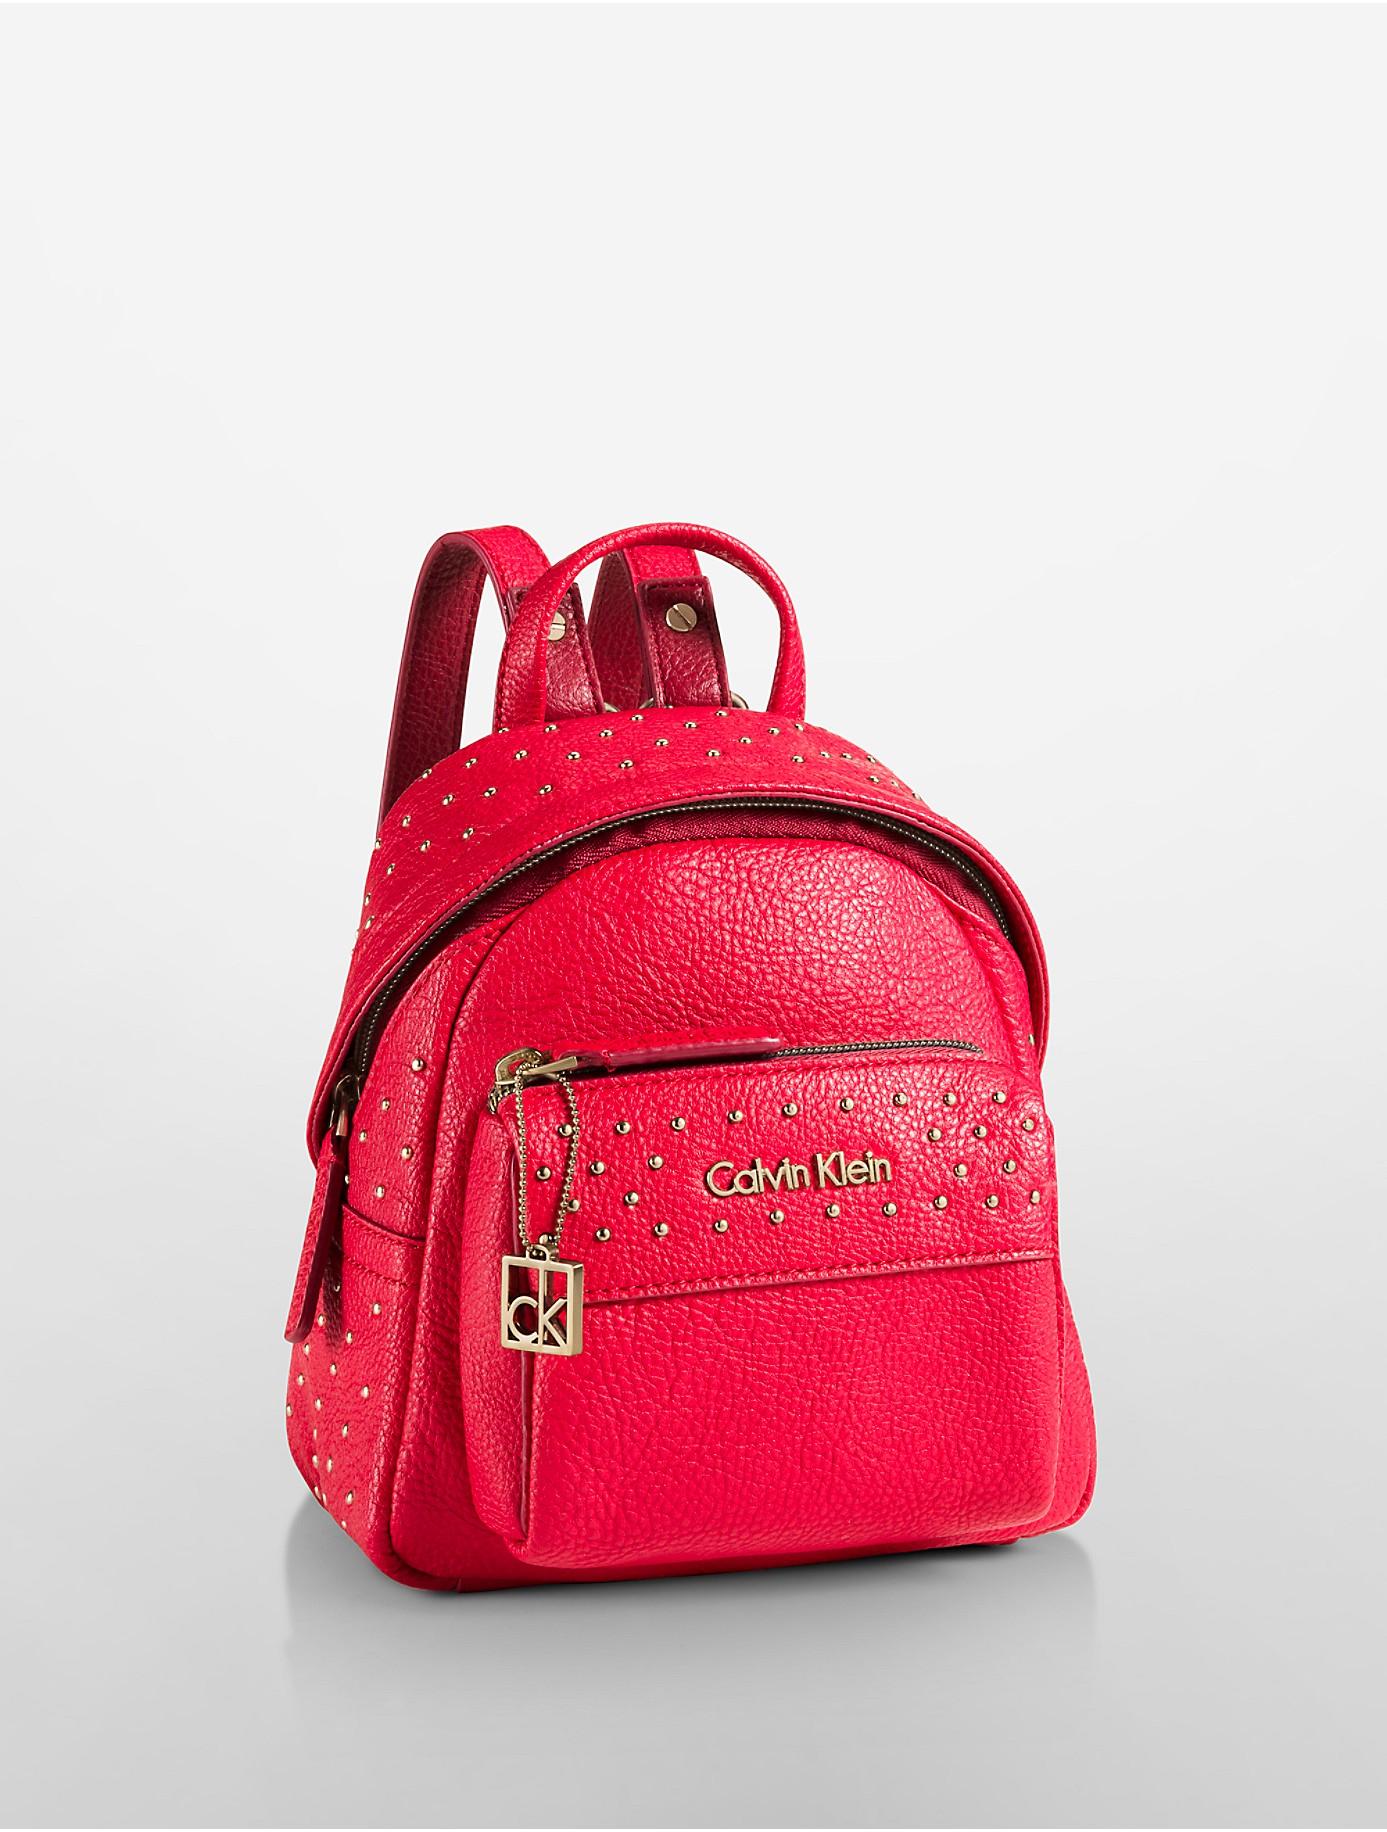 9040758d5ea Lyst - Calvin Klein White Label Hailey Studio Backpack in Purple